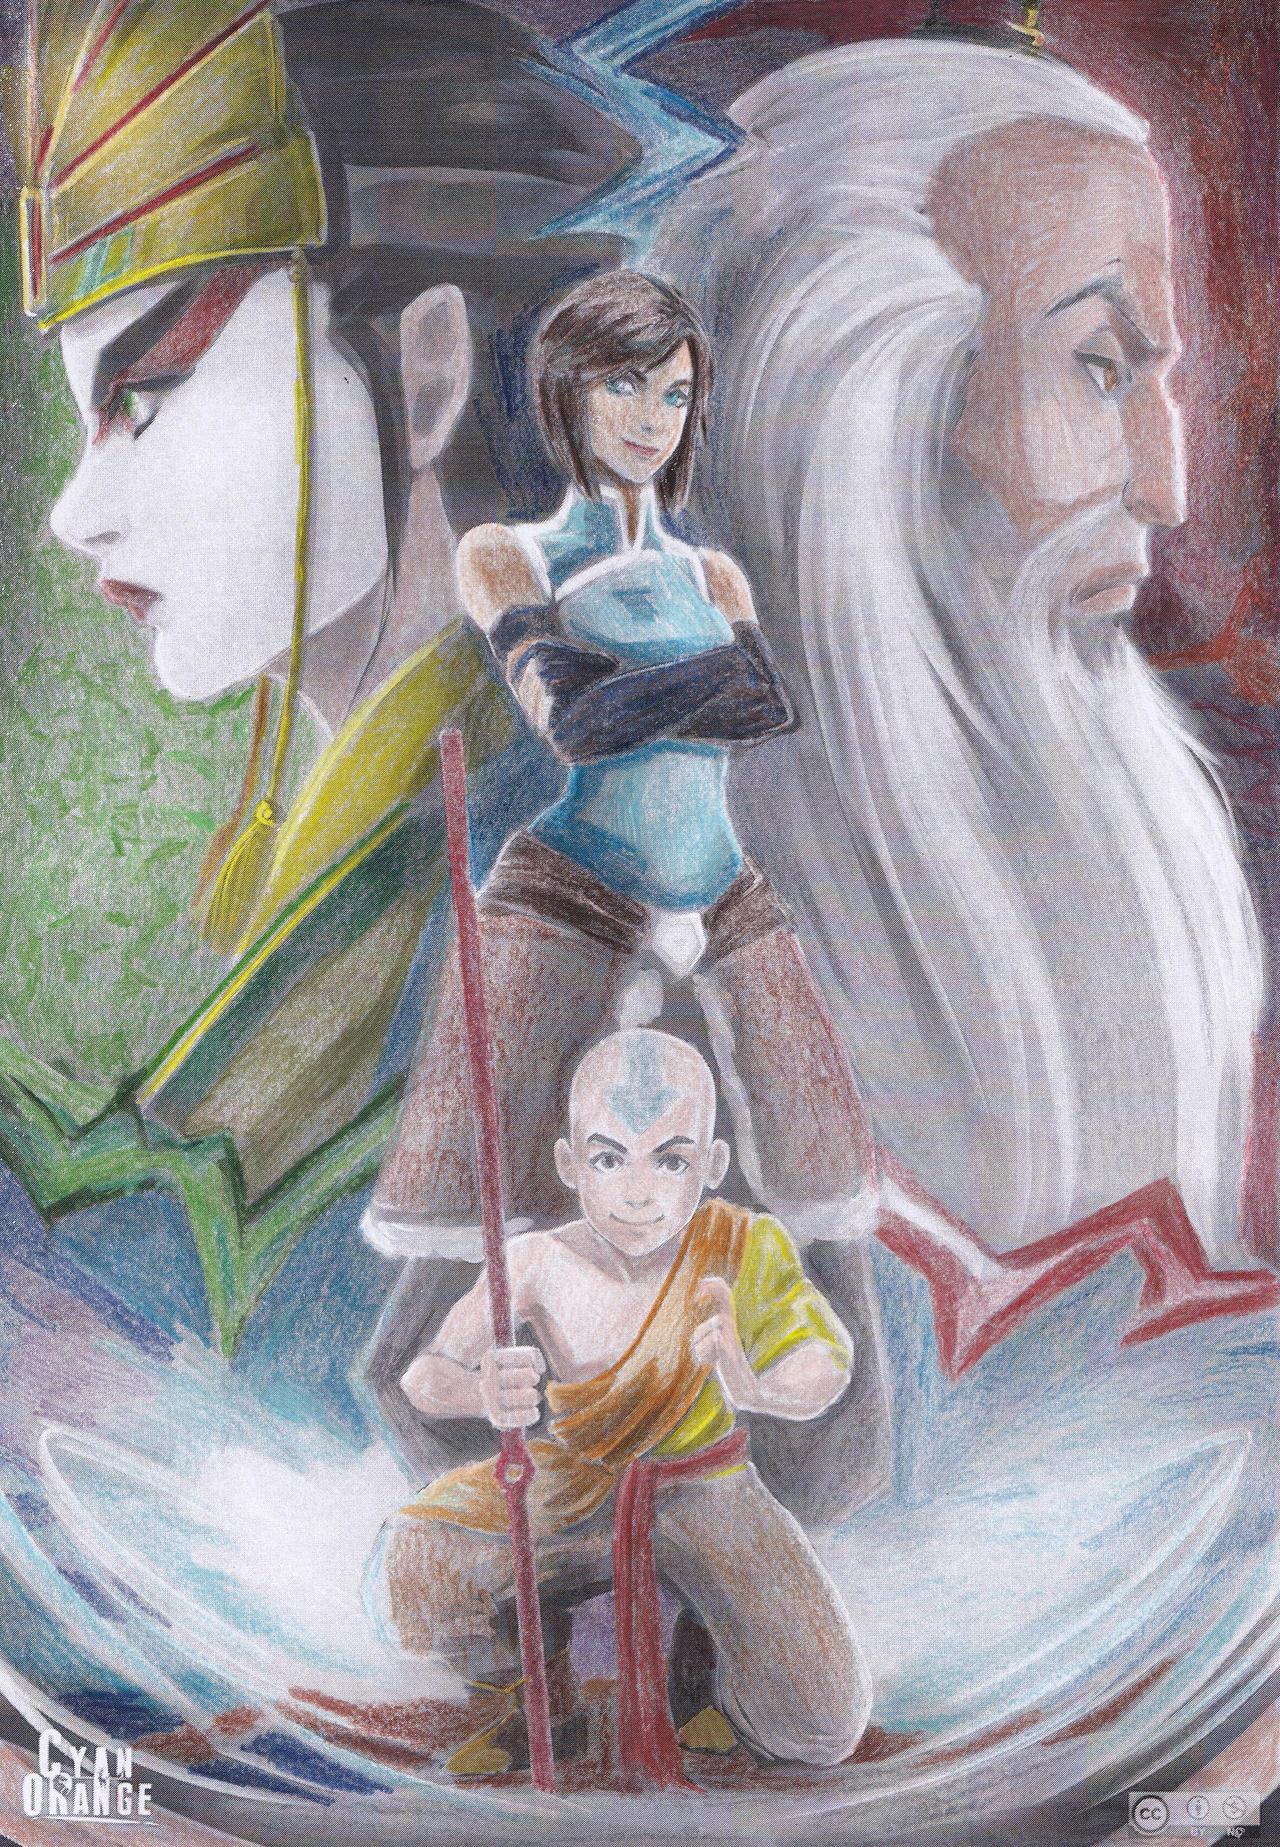 Aang Korra avatar - tla lok: kyoshi, roku, aang, korratea-iroh on